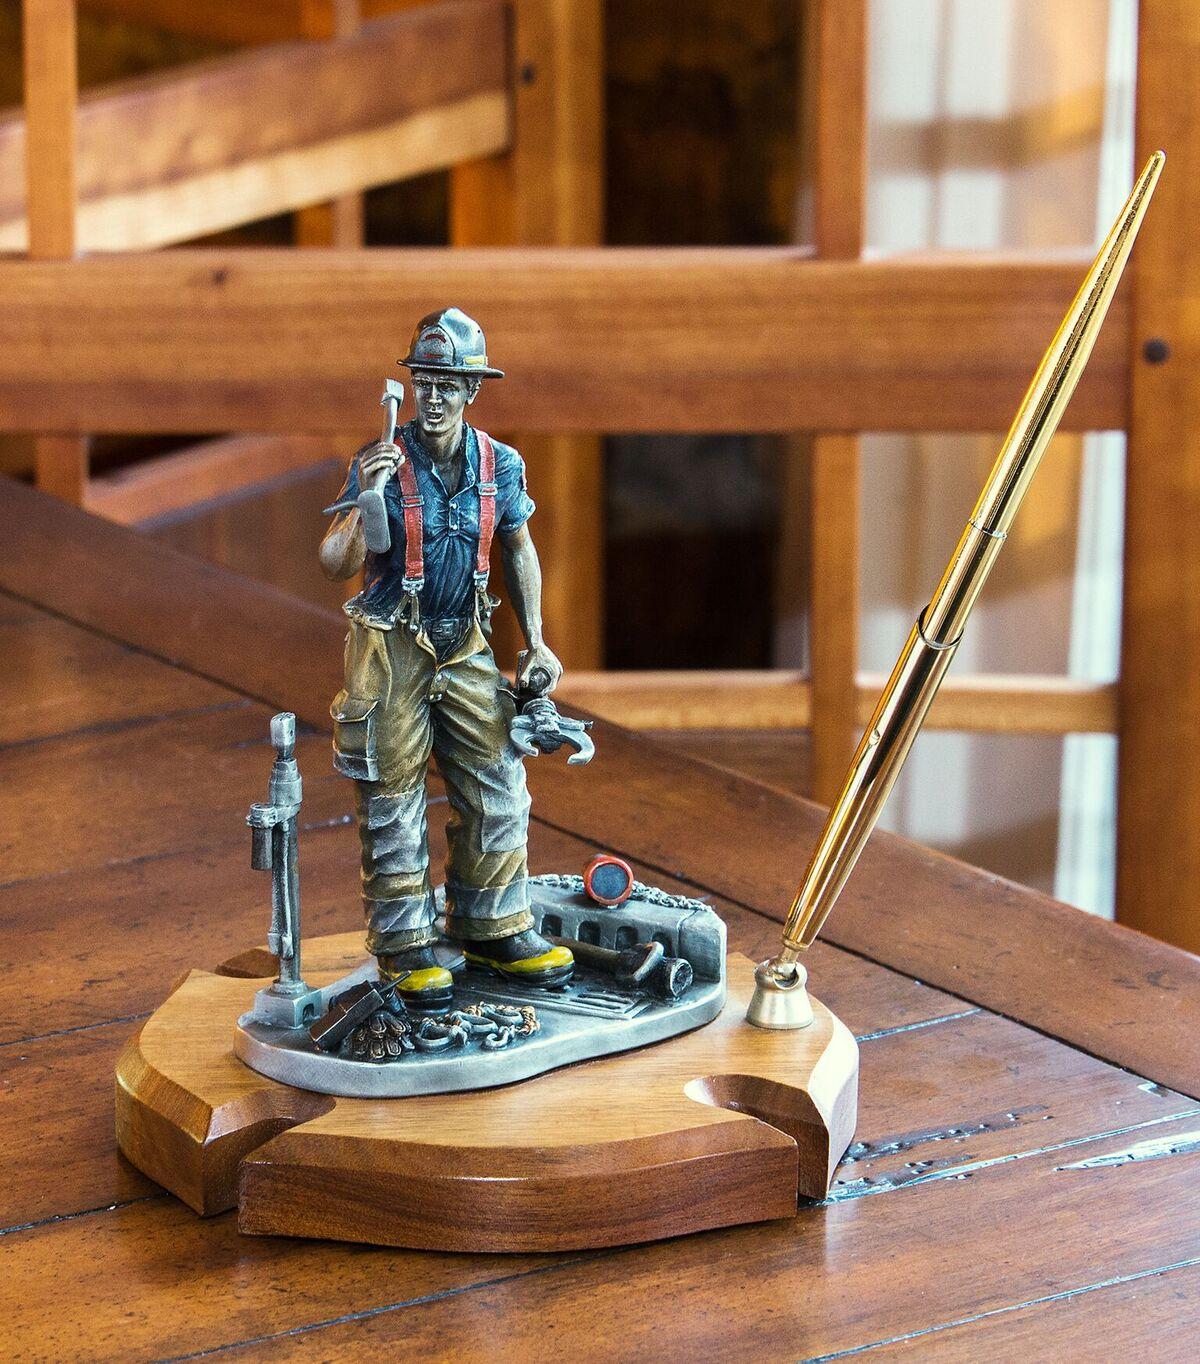 Maltese Cross Fireman Pen Set